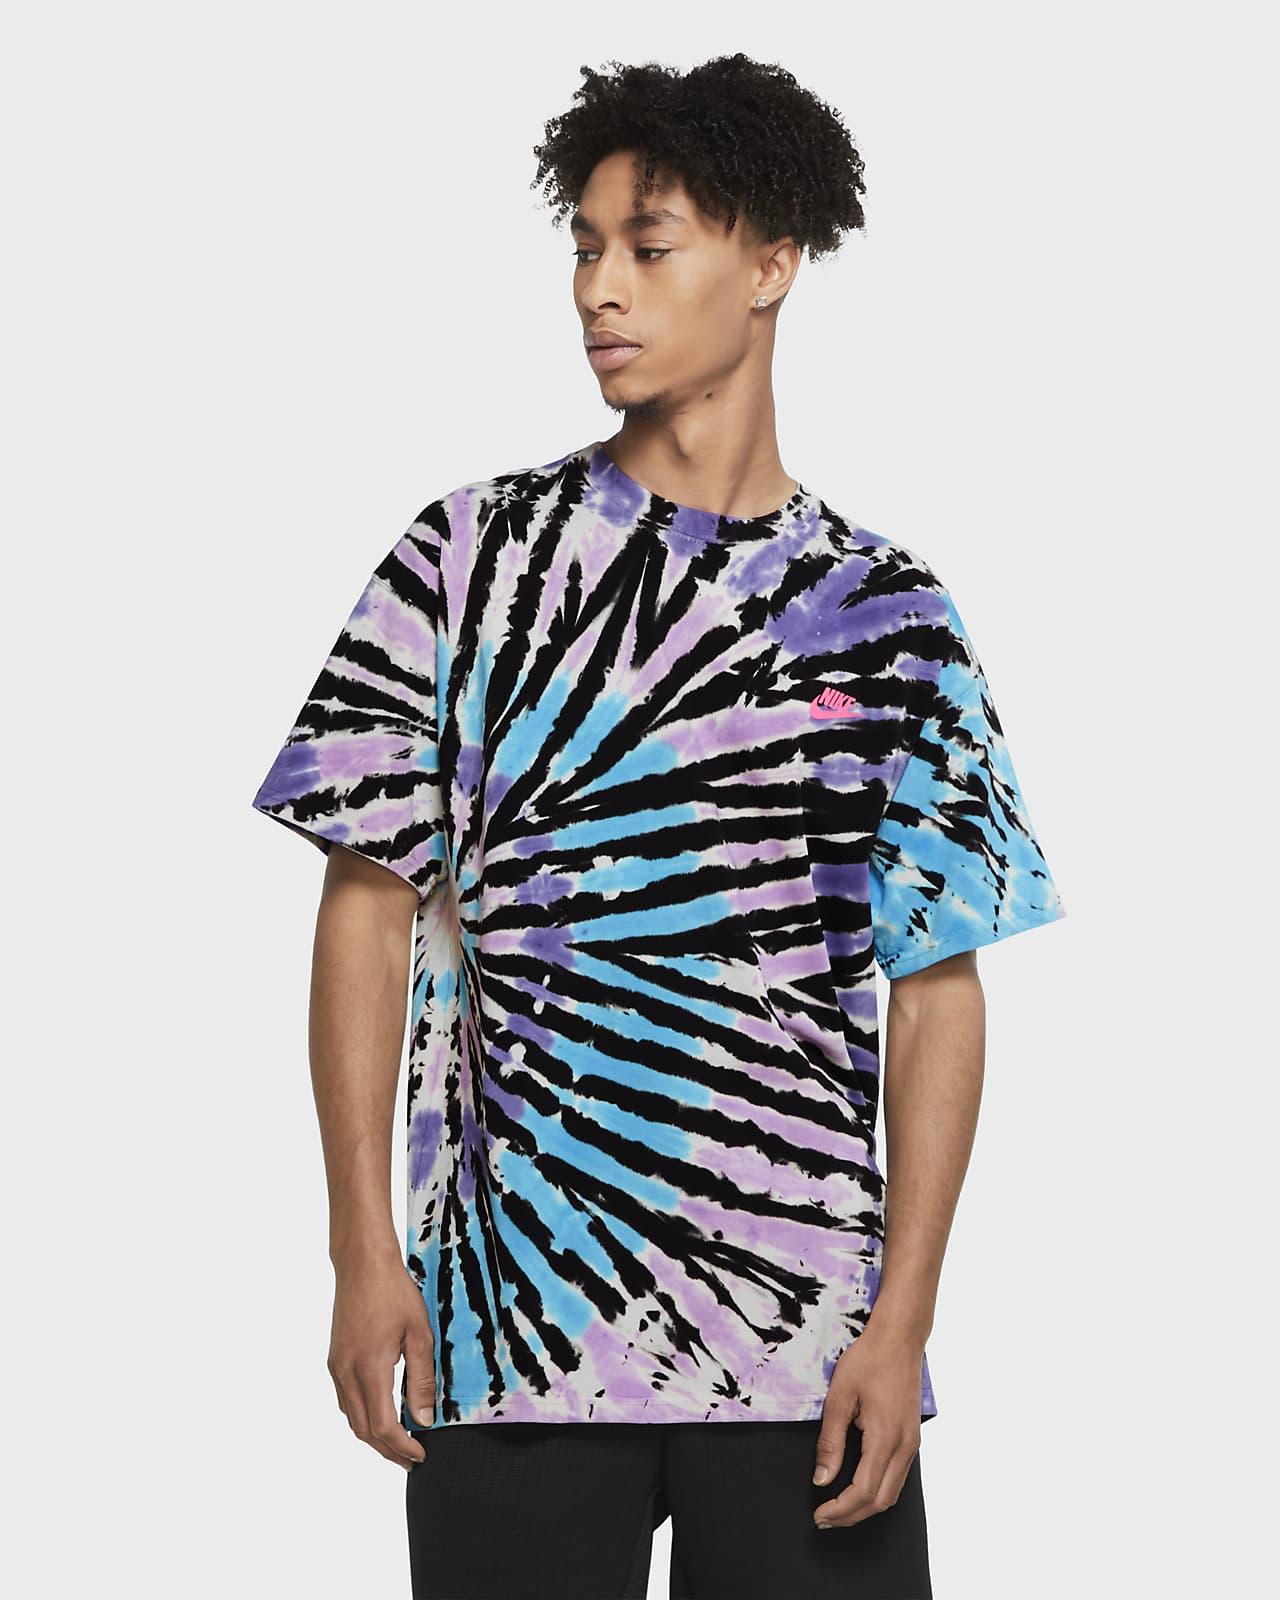 Nike Sportswear batikolt férfipóló